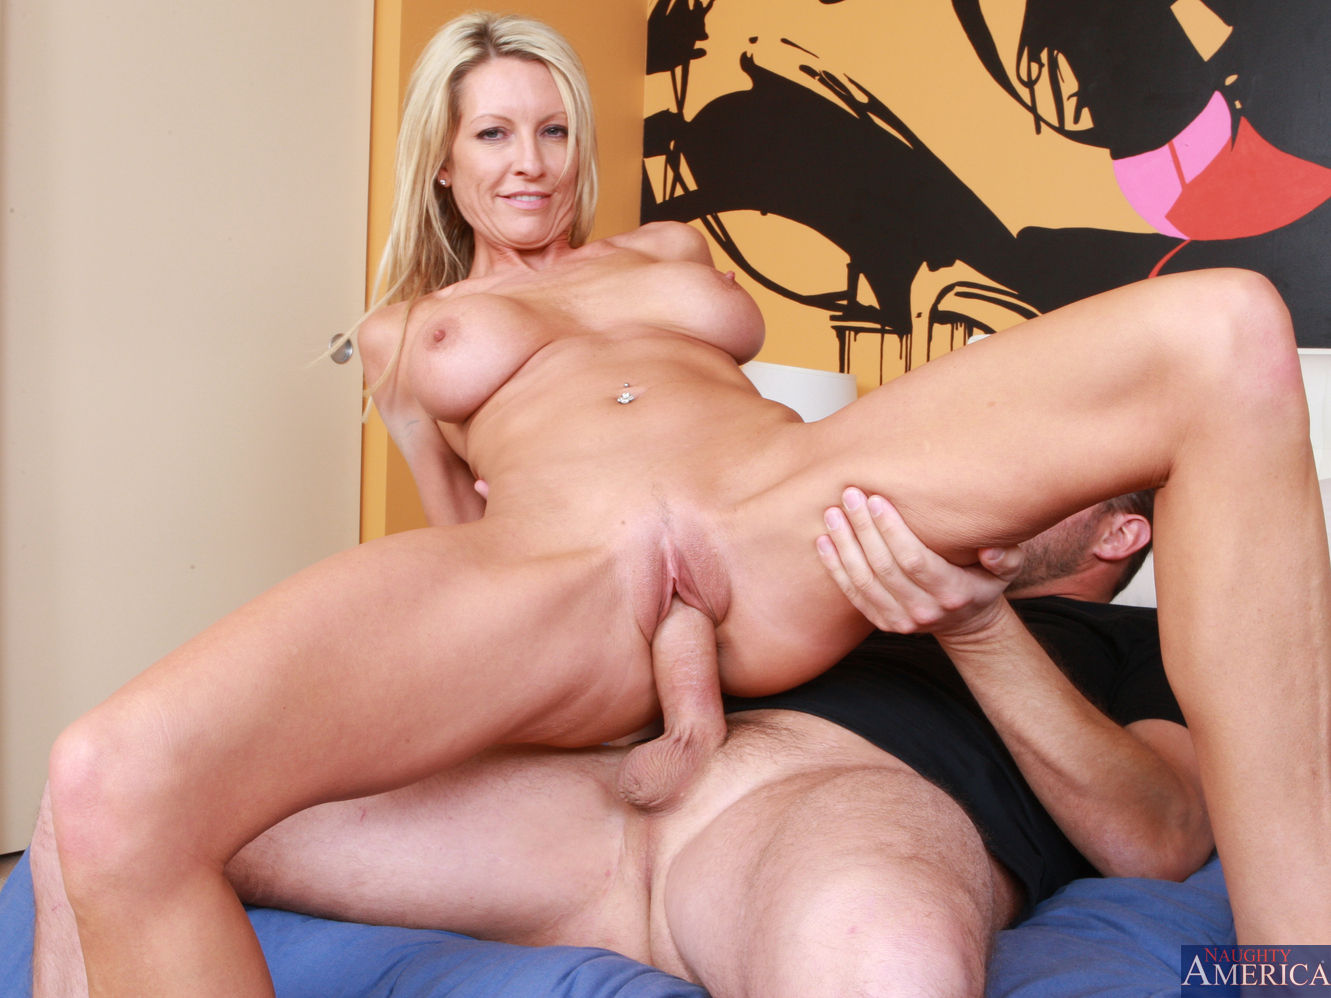 Mrs starr sex video #6